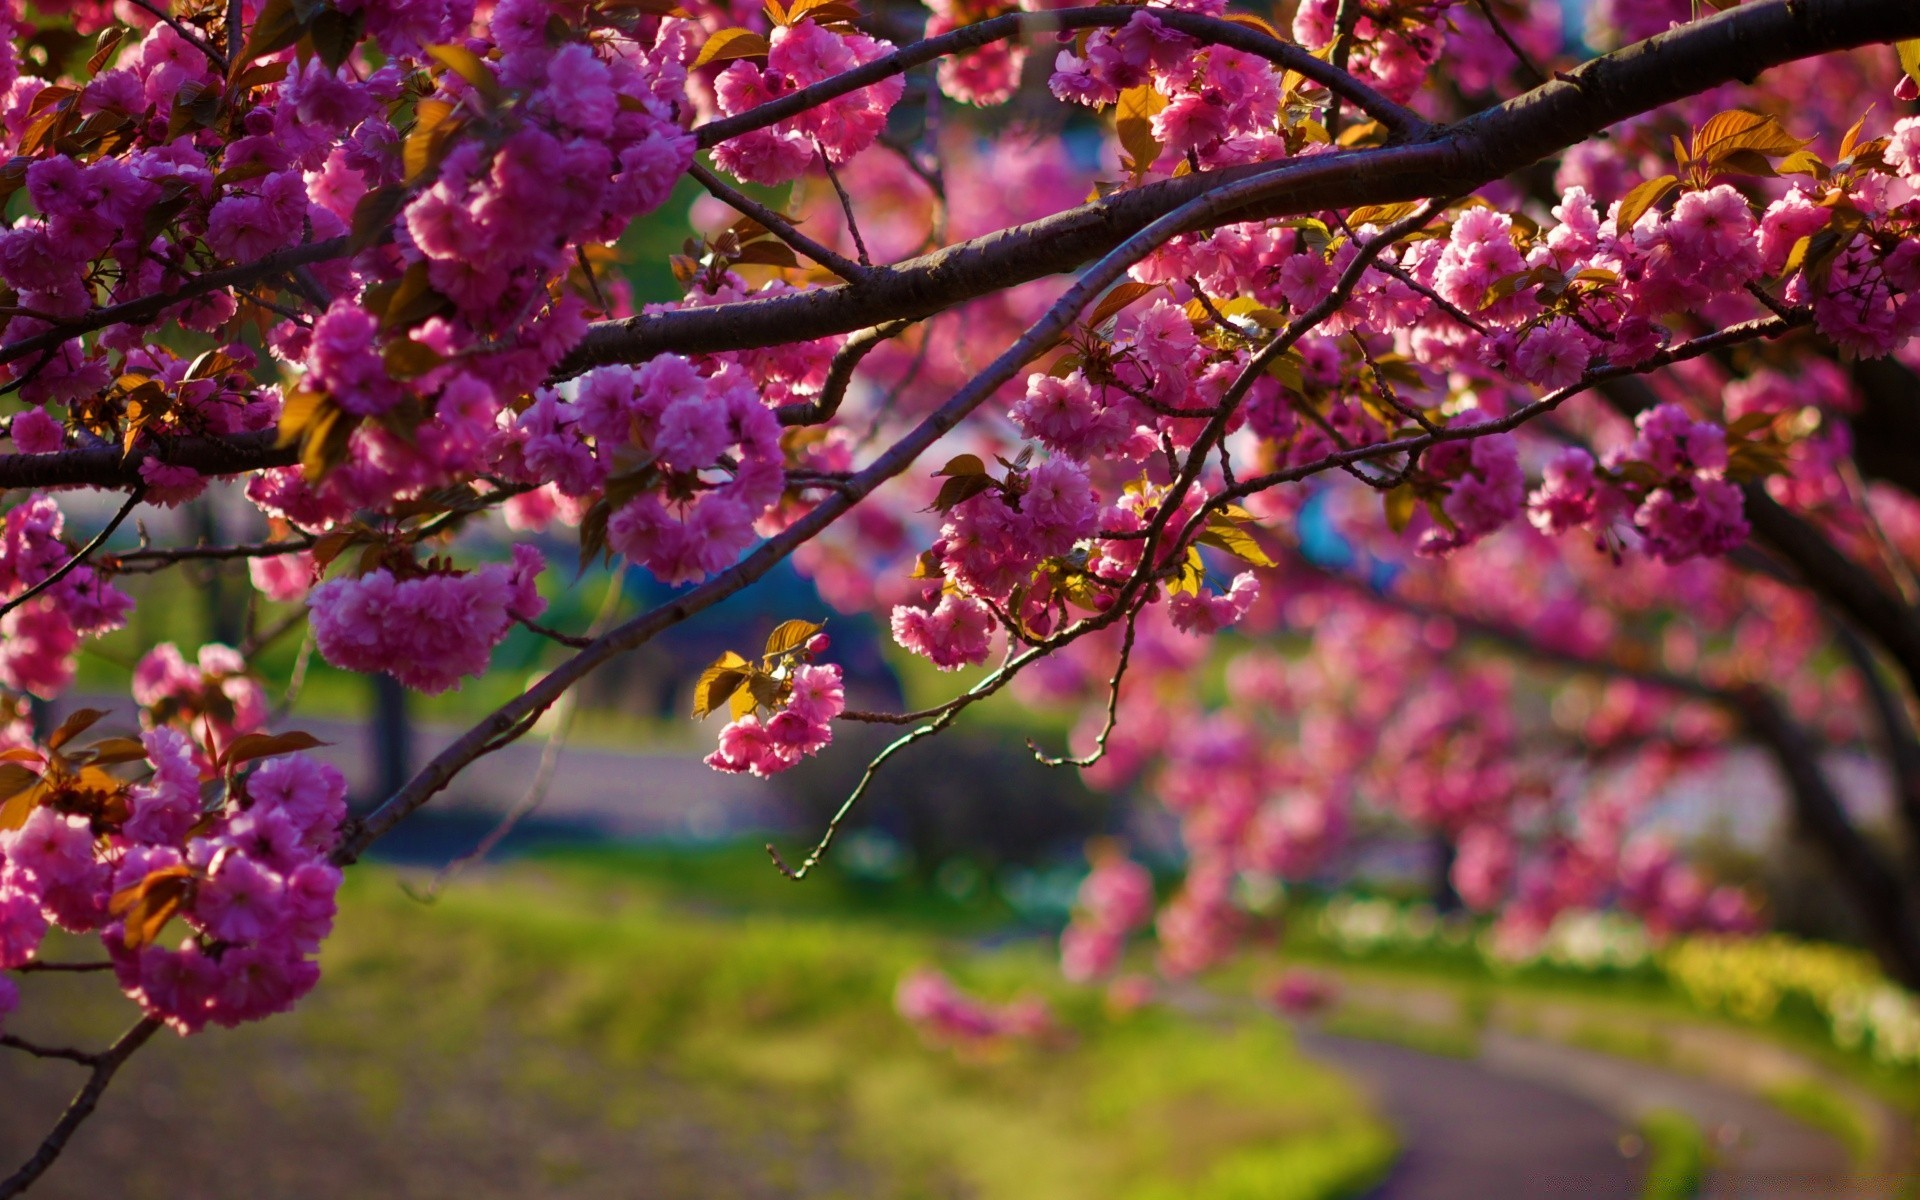 Весна фото обои для мобильника